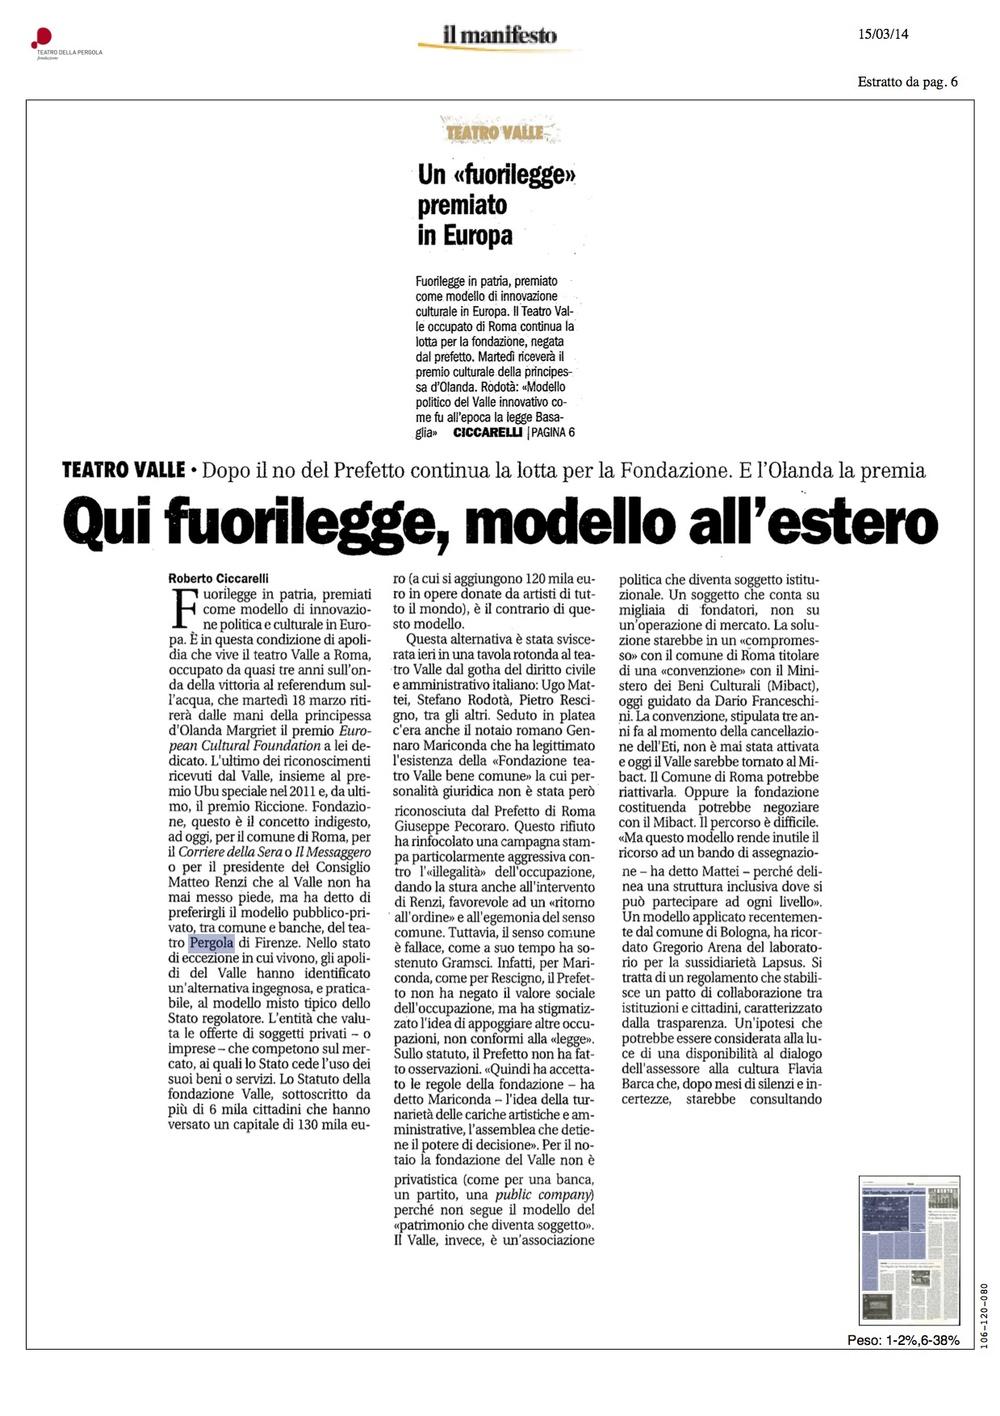 Il Manifesto_15_03_2014.jpg